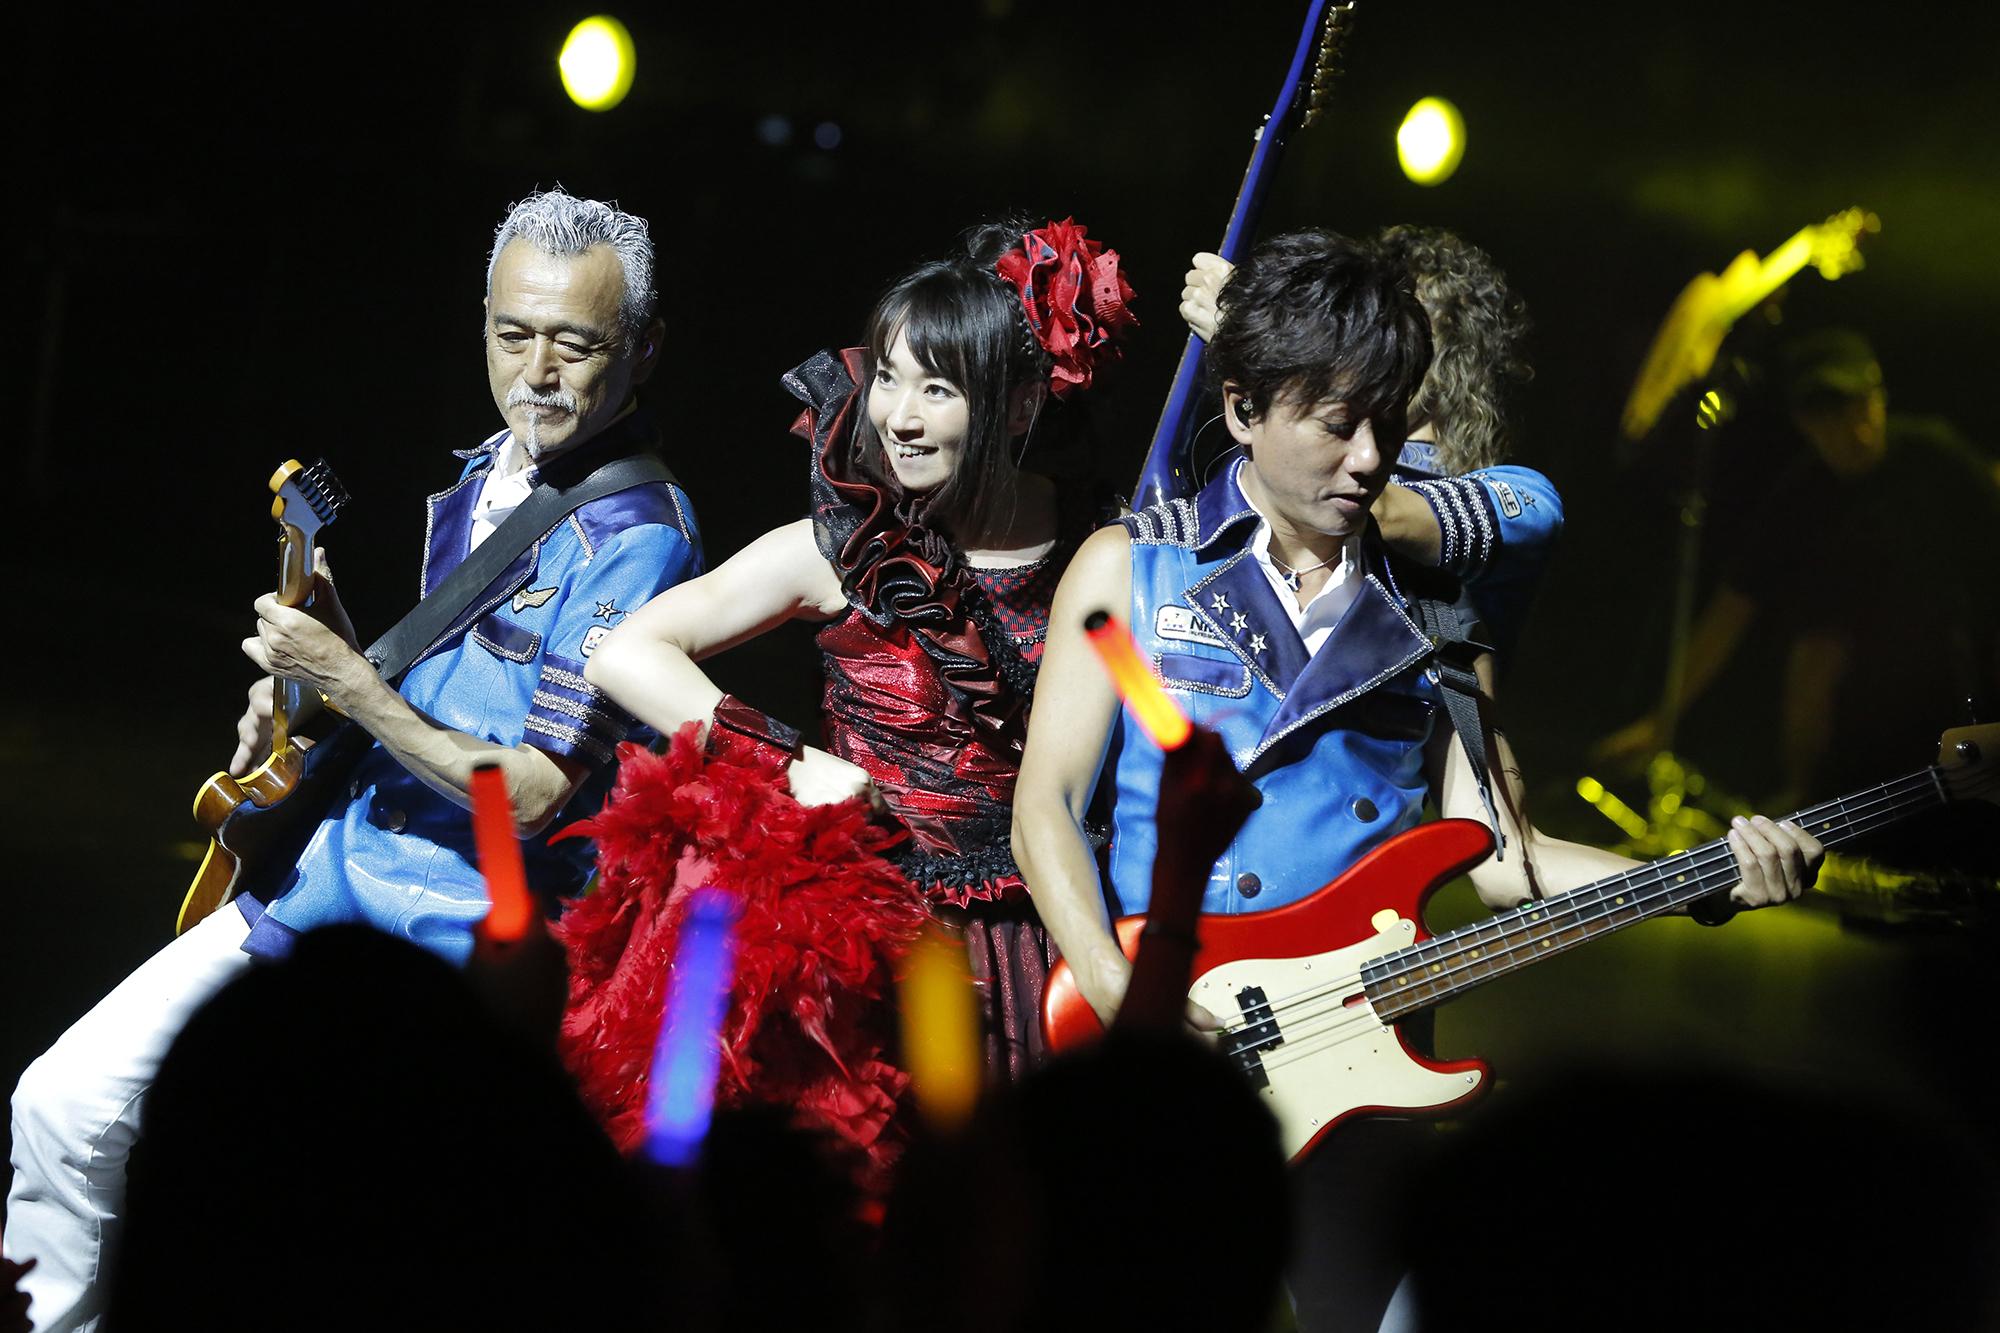 Nana Mizuki Live Flight+ 2014 in Singapore